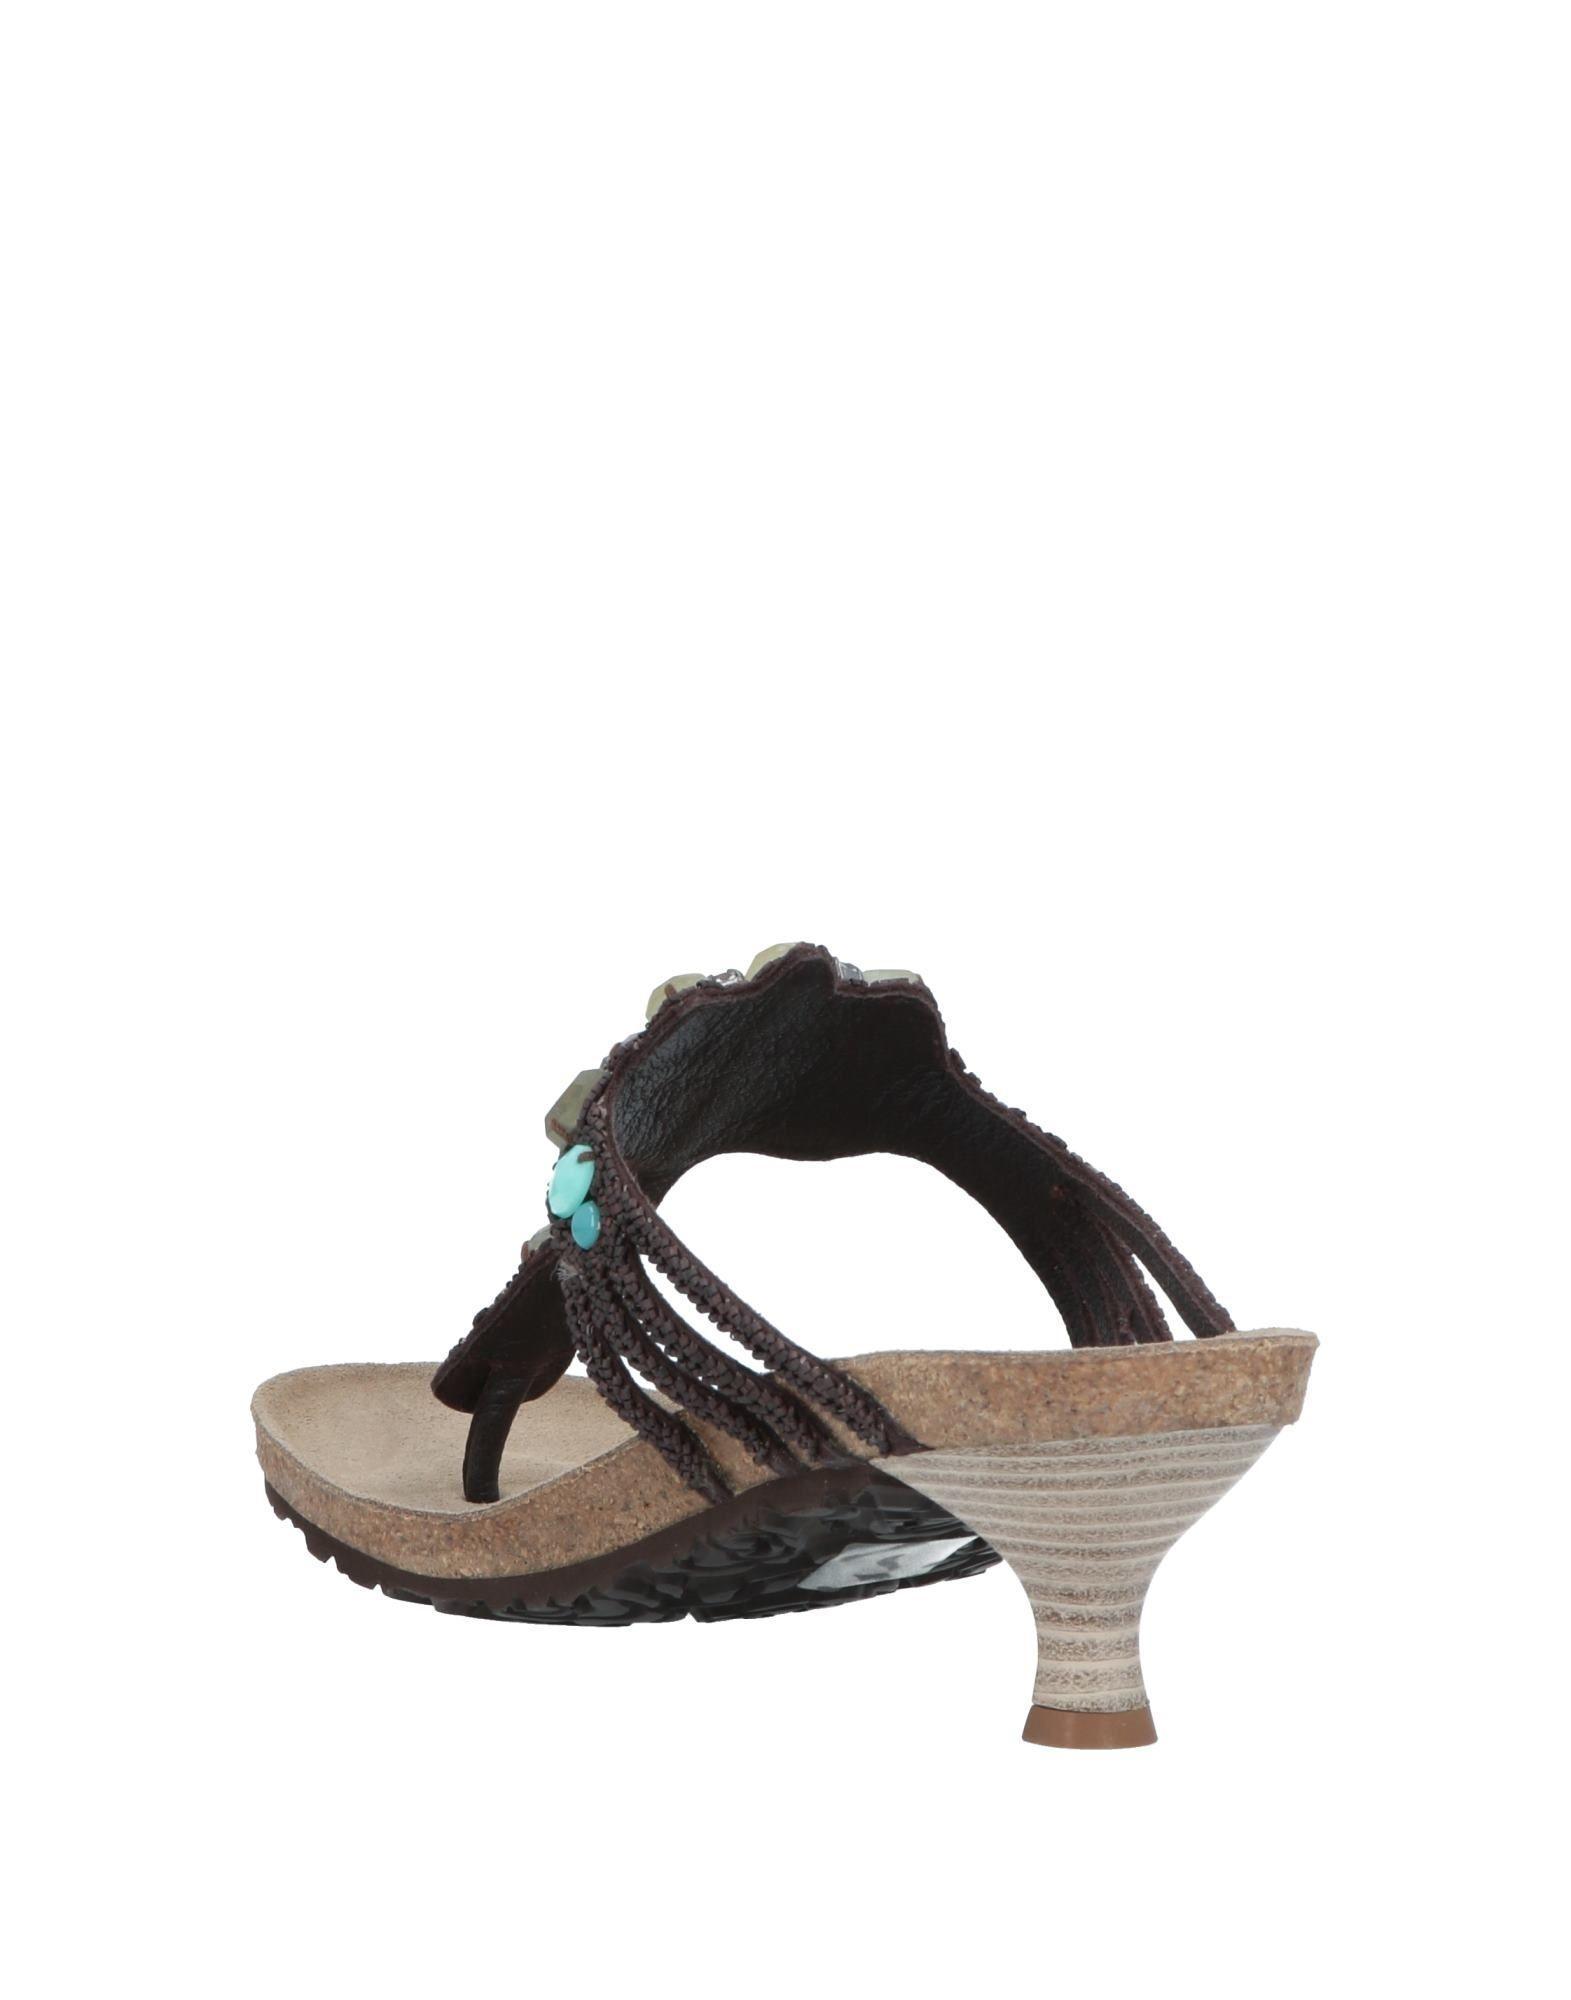 3d8a03ea62fb Lyst - Maliparmi Toe Post Sandal in Brown